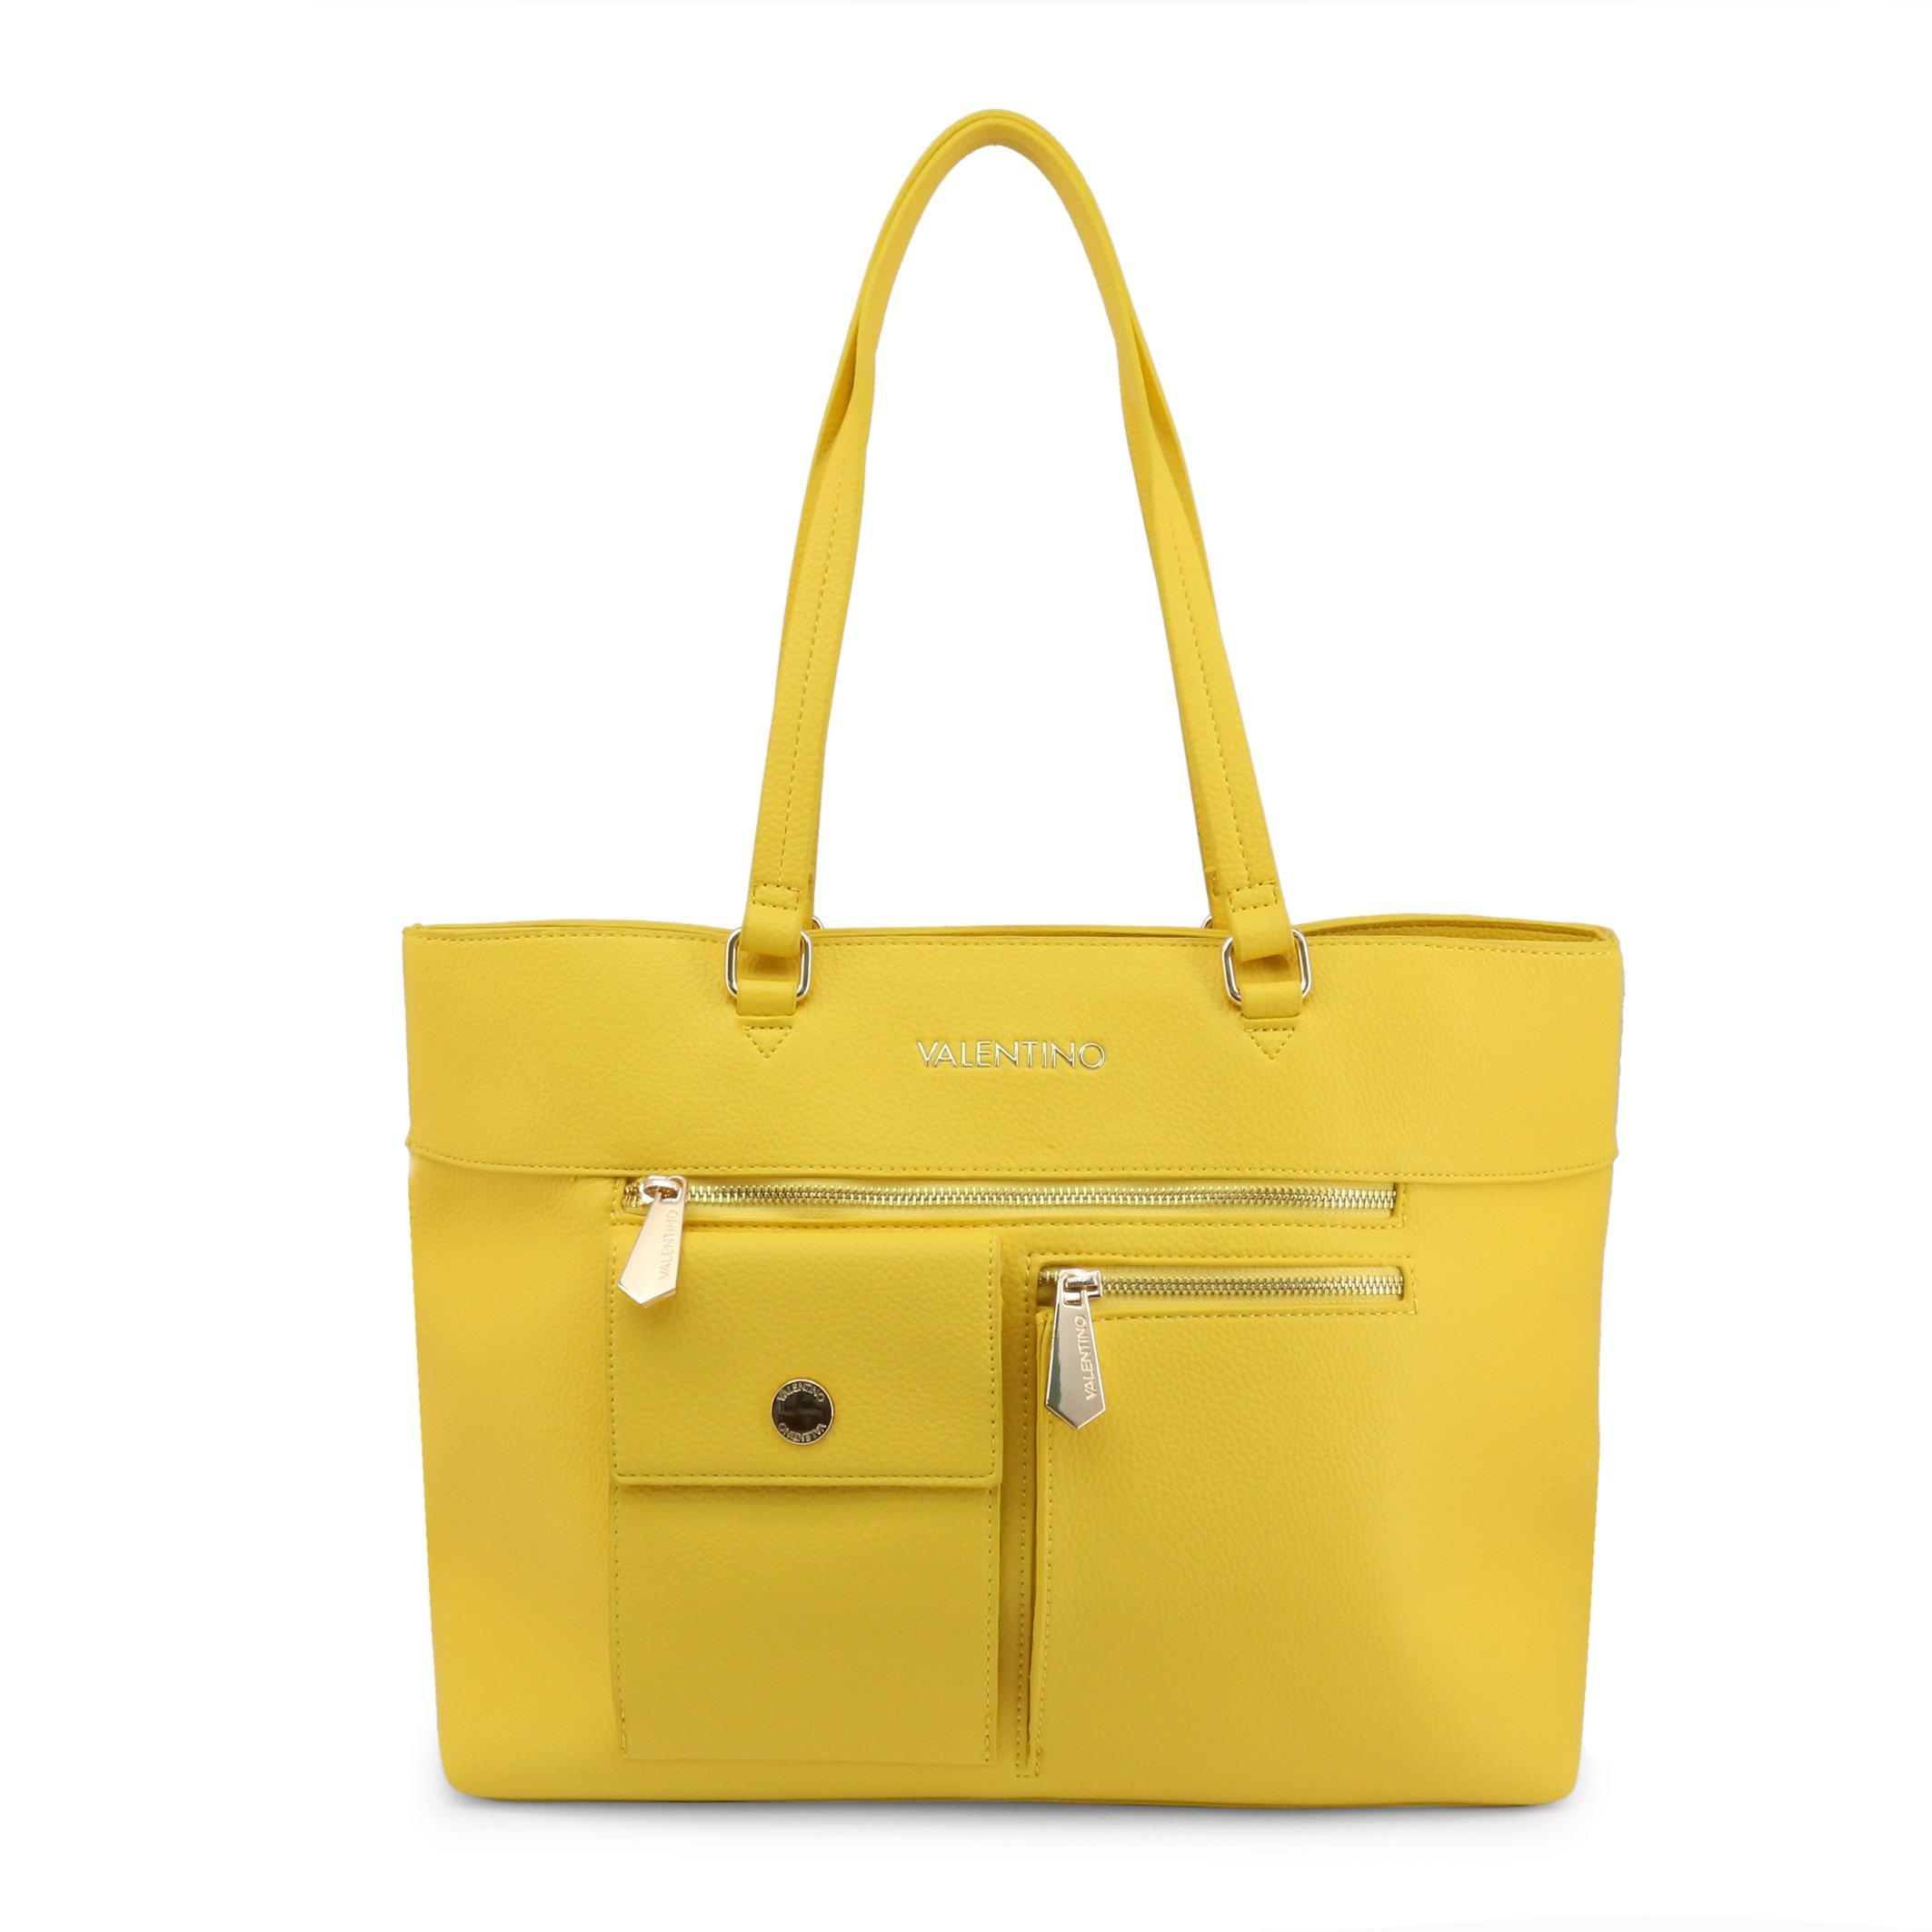 Valentino by Mario Valentino Women's Shopping Bag Various Colours CASPER-VBS3XL01 - yellow NOSIZE